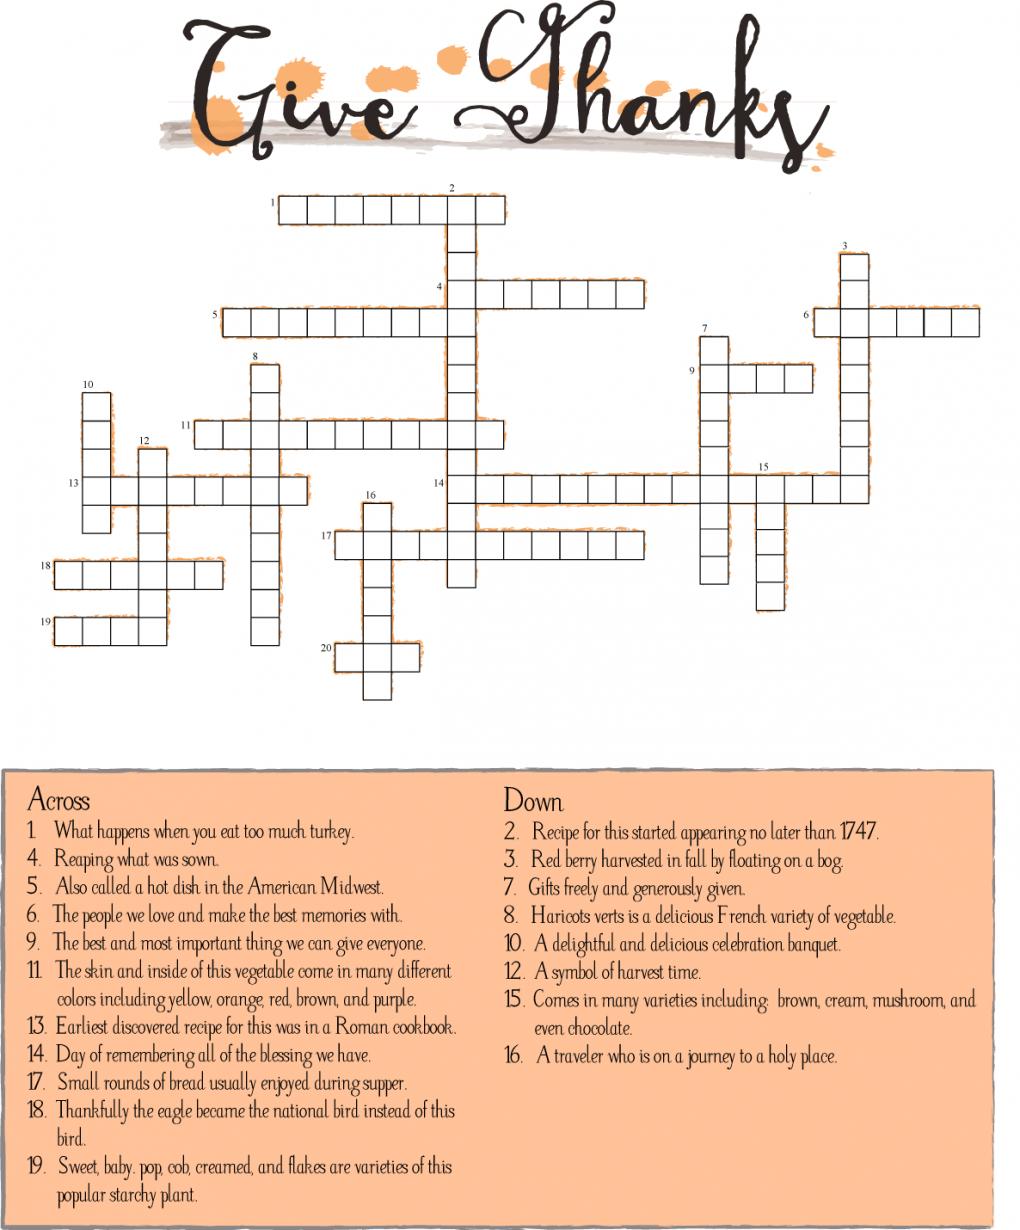 10 Superfun Thanksgiving Crossword Puzzles | Kittybabylove - Thanksgiving Crossword Puzzle Printable